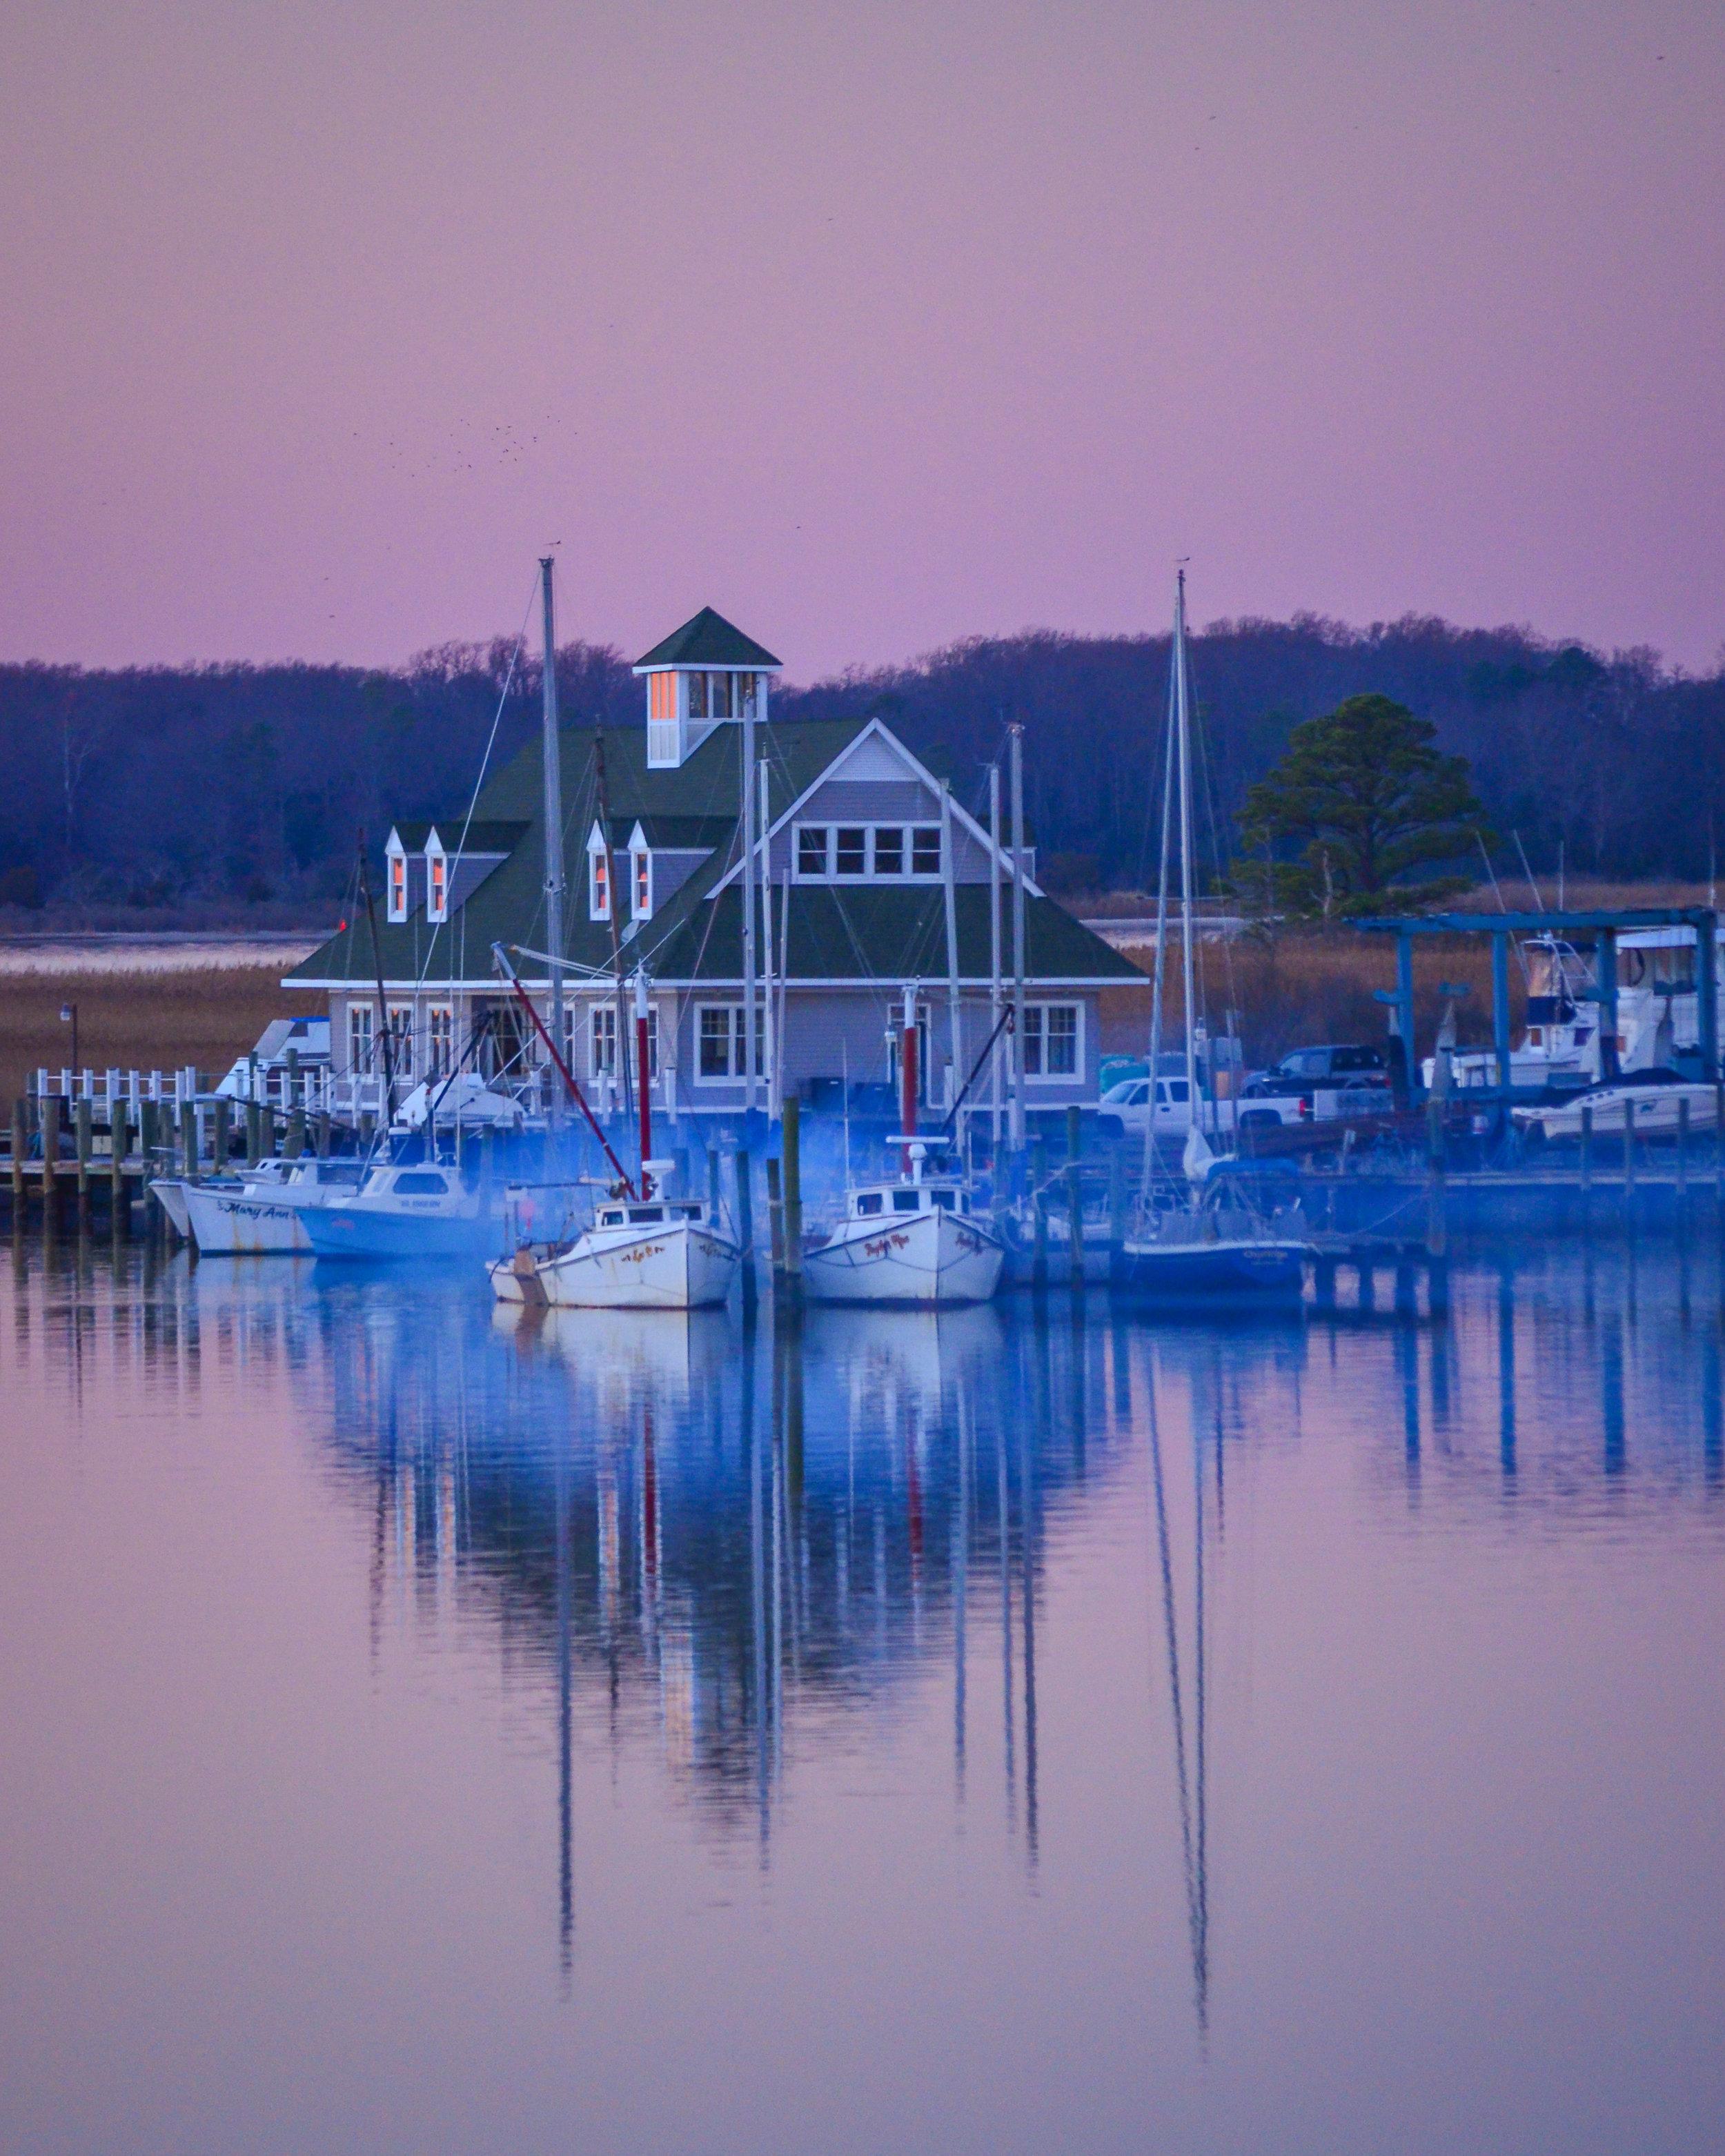 purple haze-marina-boats-reflection-water-Isle of Wight County-Virginia.jpg